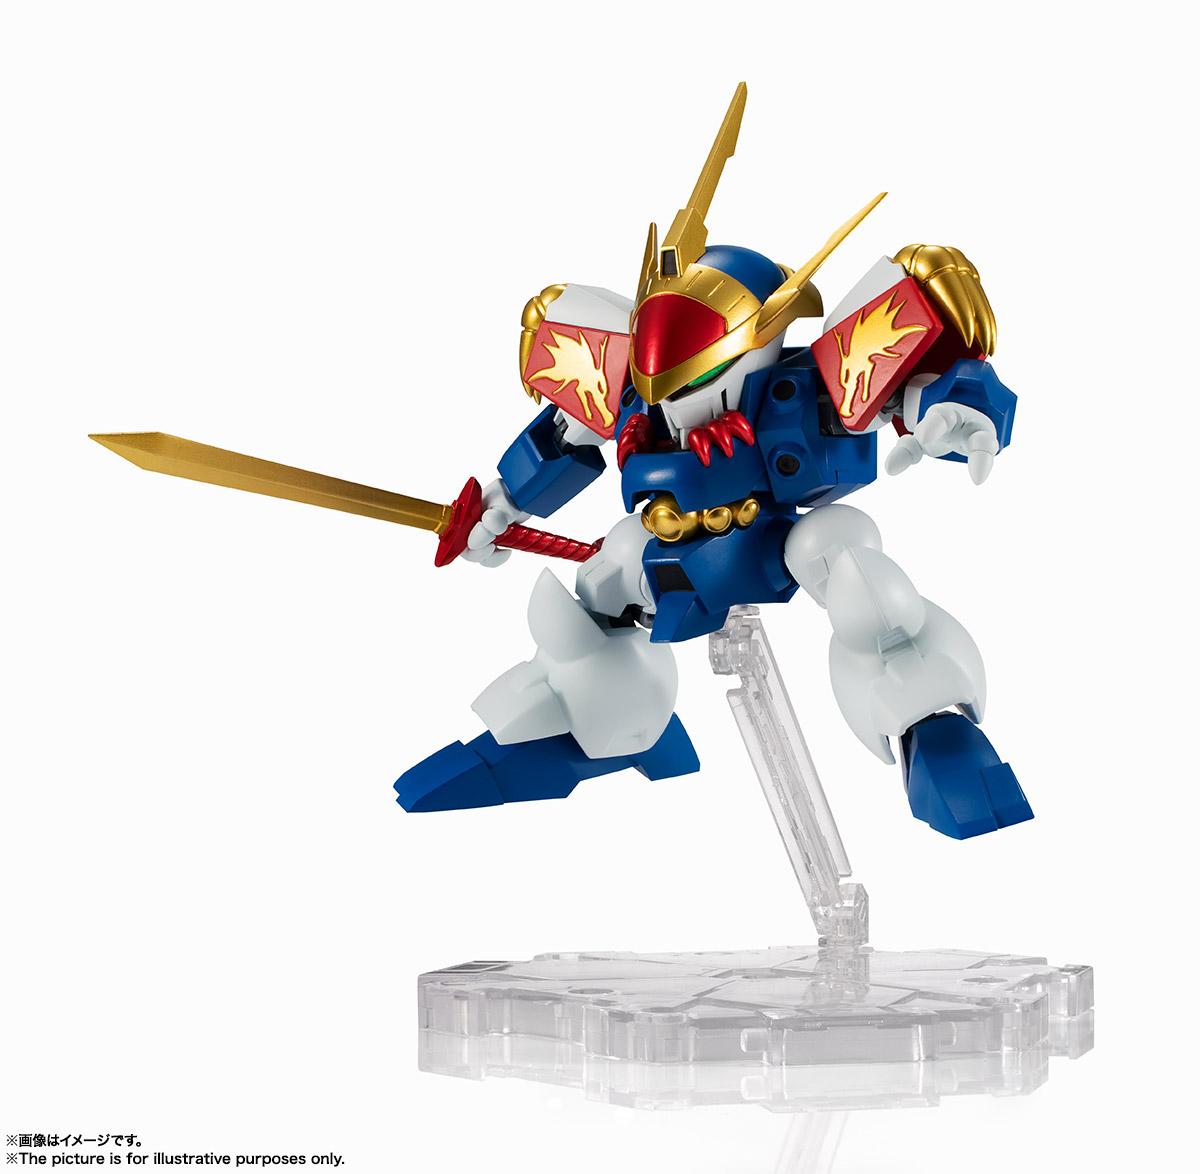 NXEDGE STYLE [MASHIN UNIT] 『龍神丸』魔神英雄伝ワタル 可動フィギュア-001